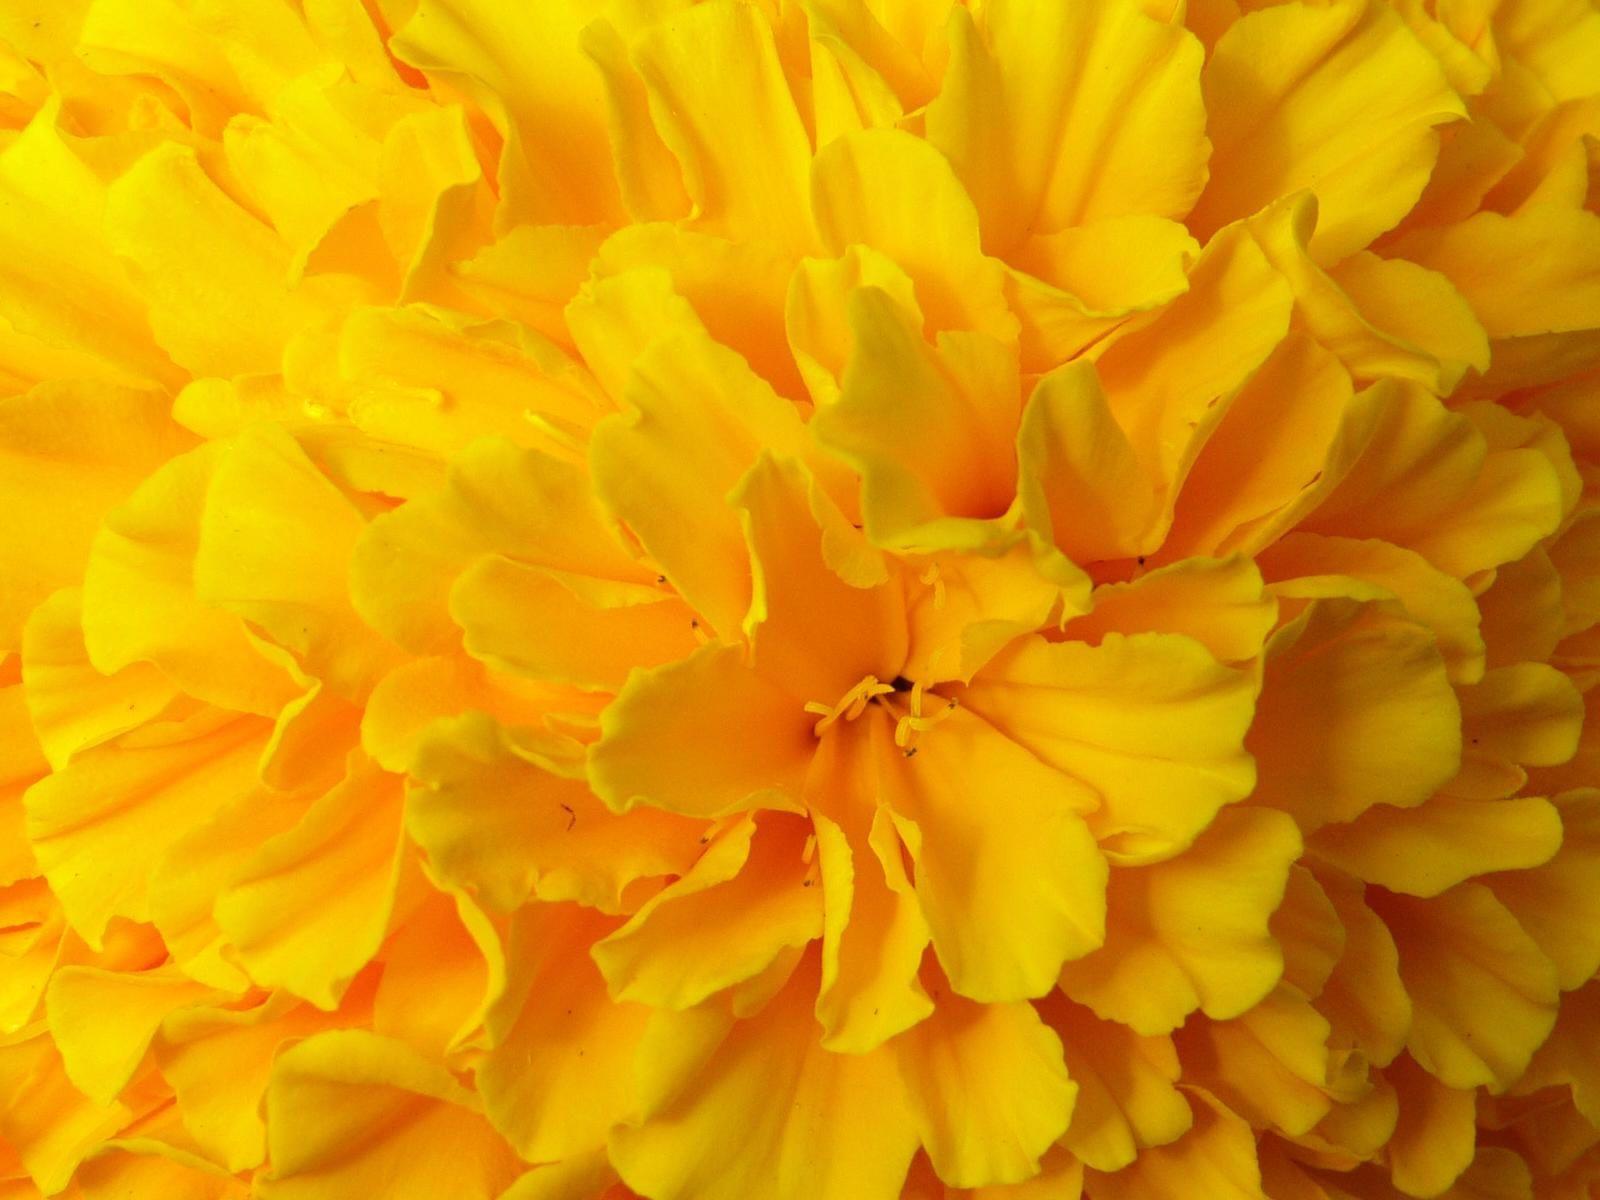 Pin By Tanya Hernandez On Yellow Dark And Light Yellow Flower Wallpaper Yellow Flowers Flower Desktop Wallpaper